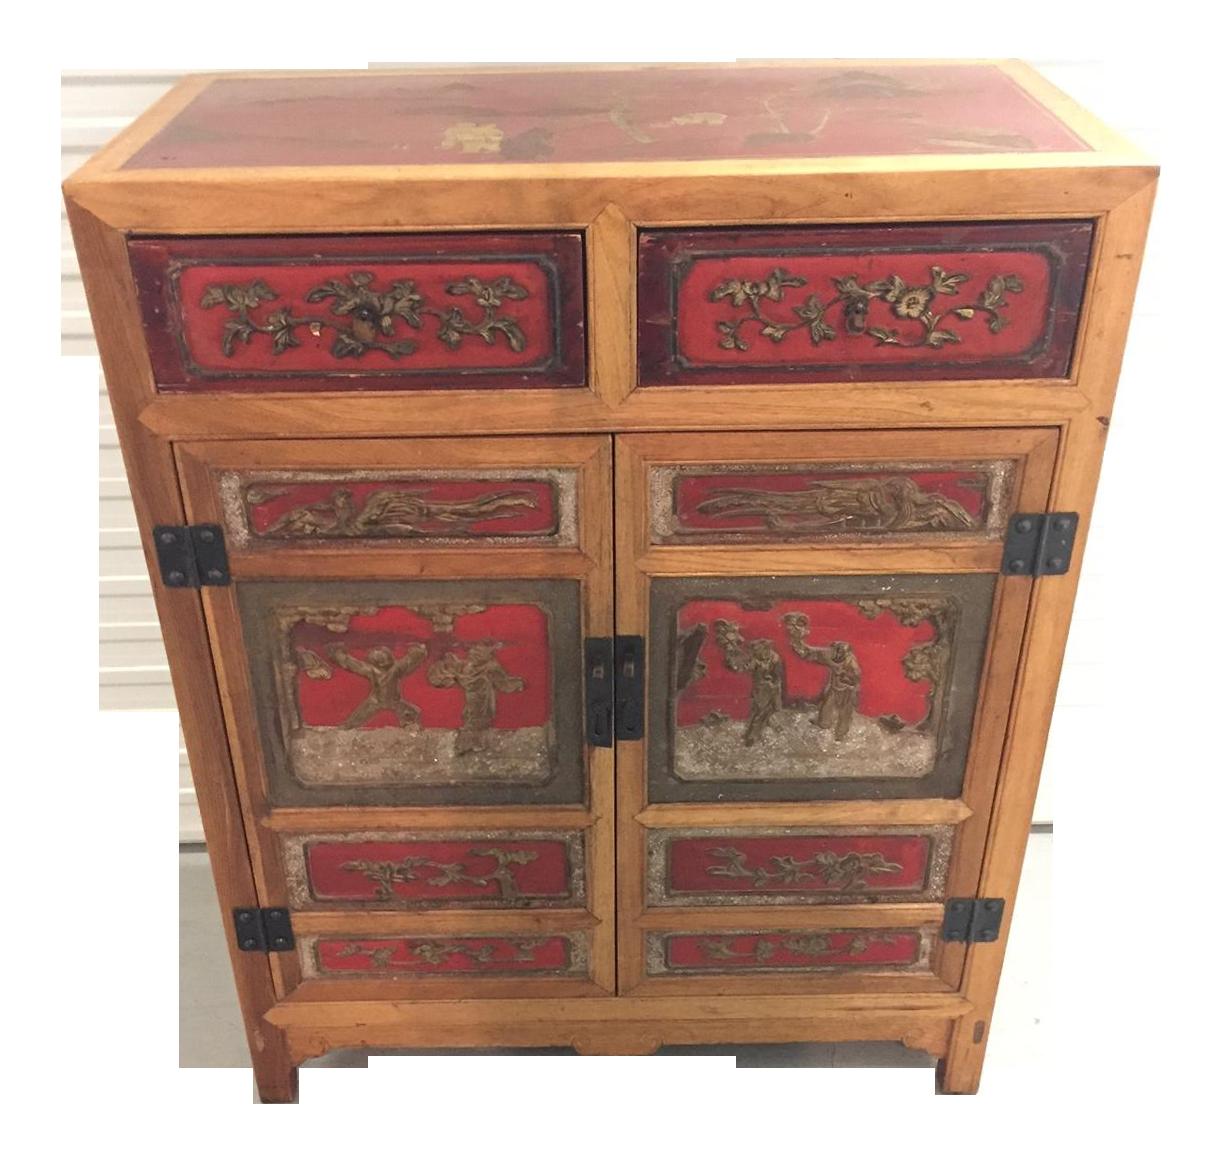 Japanese Kitchen Cabinets: Japanese Antique Cabinet